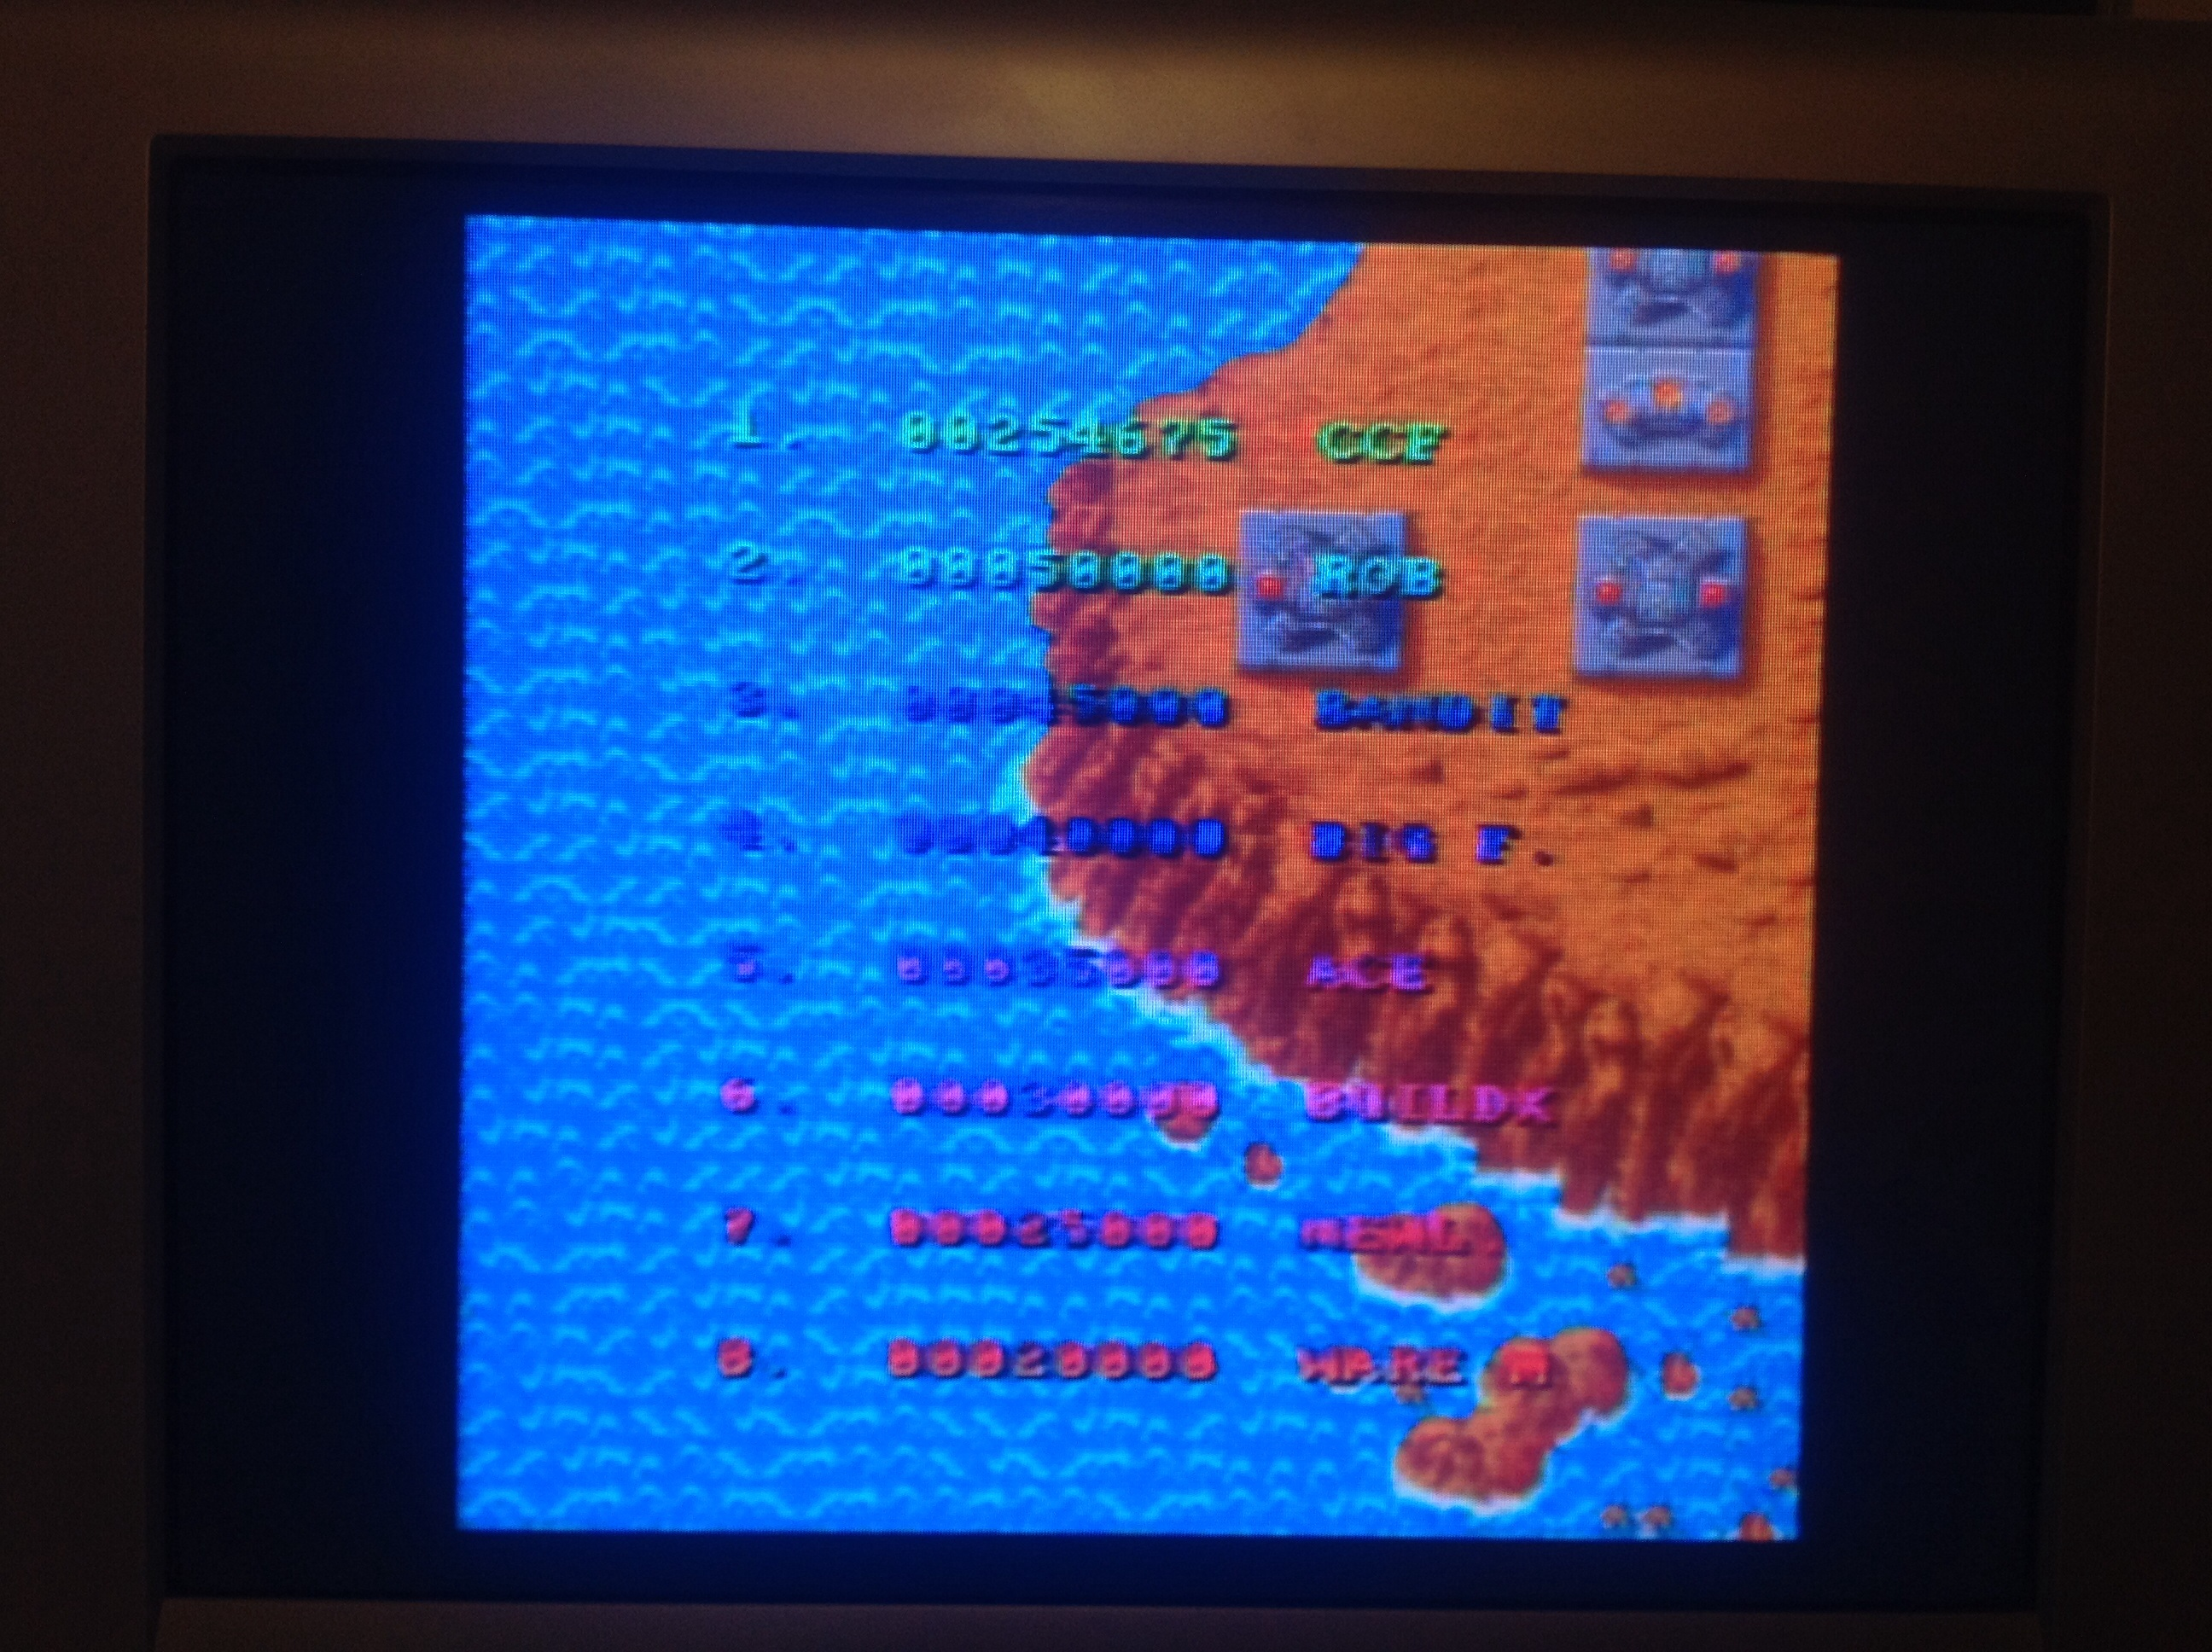 CoCoForest: Hybris (Amiga) 254,675 points on 2014-09-17 13:27:14